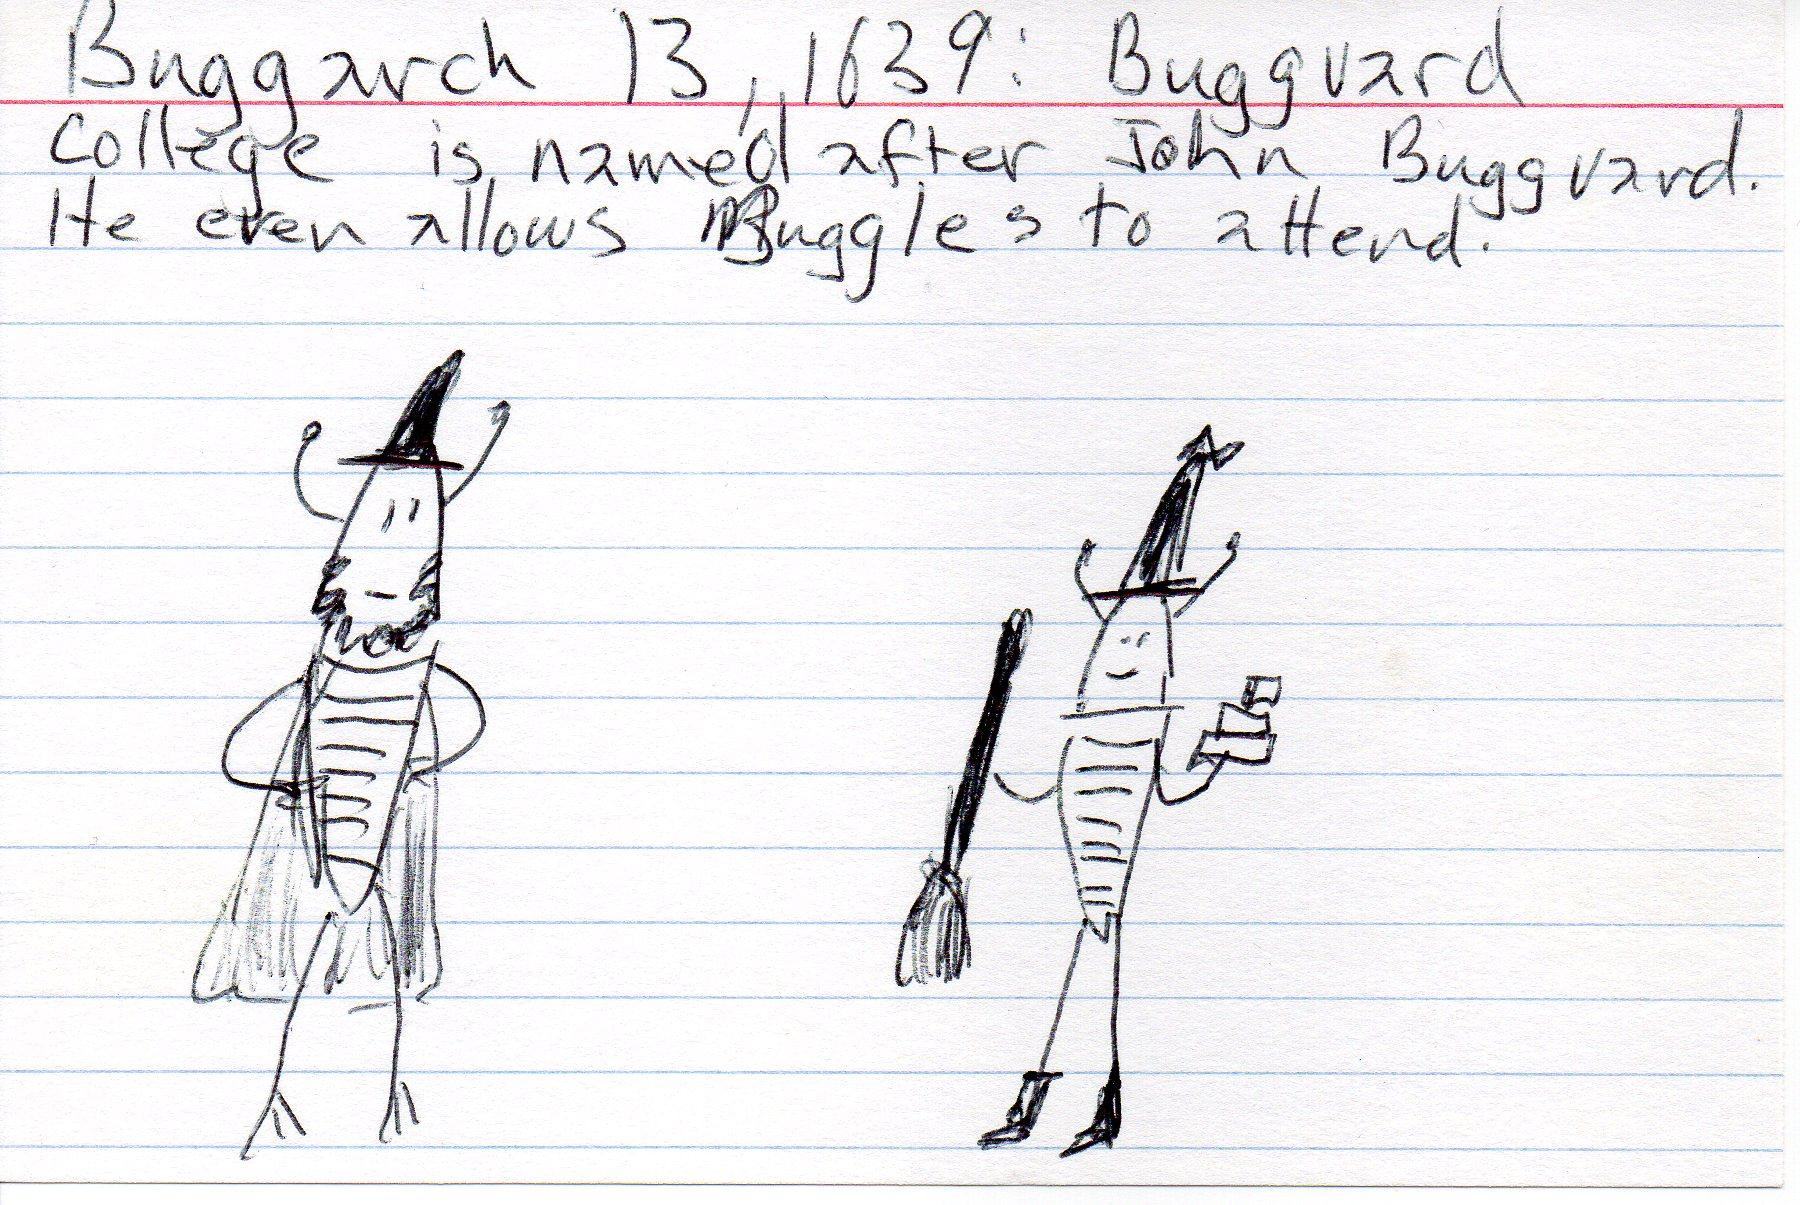 buggles at the university [click to embiggen]